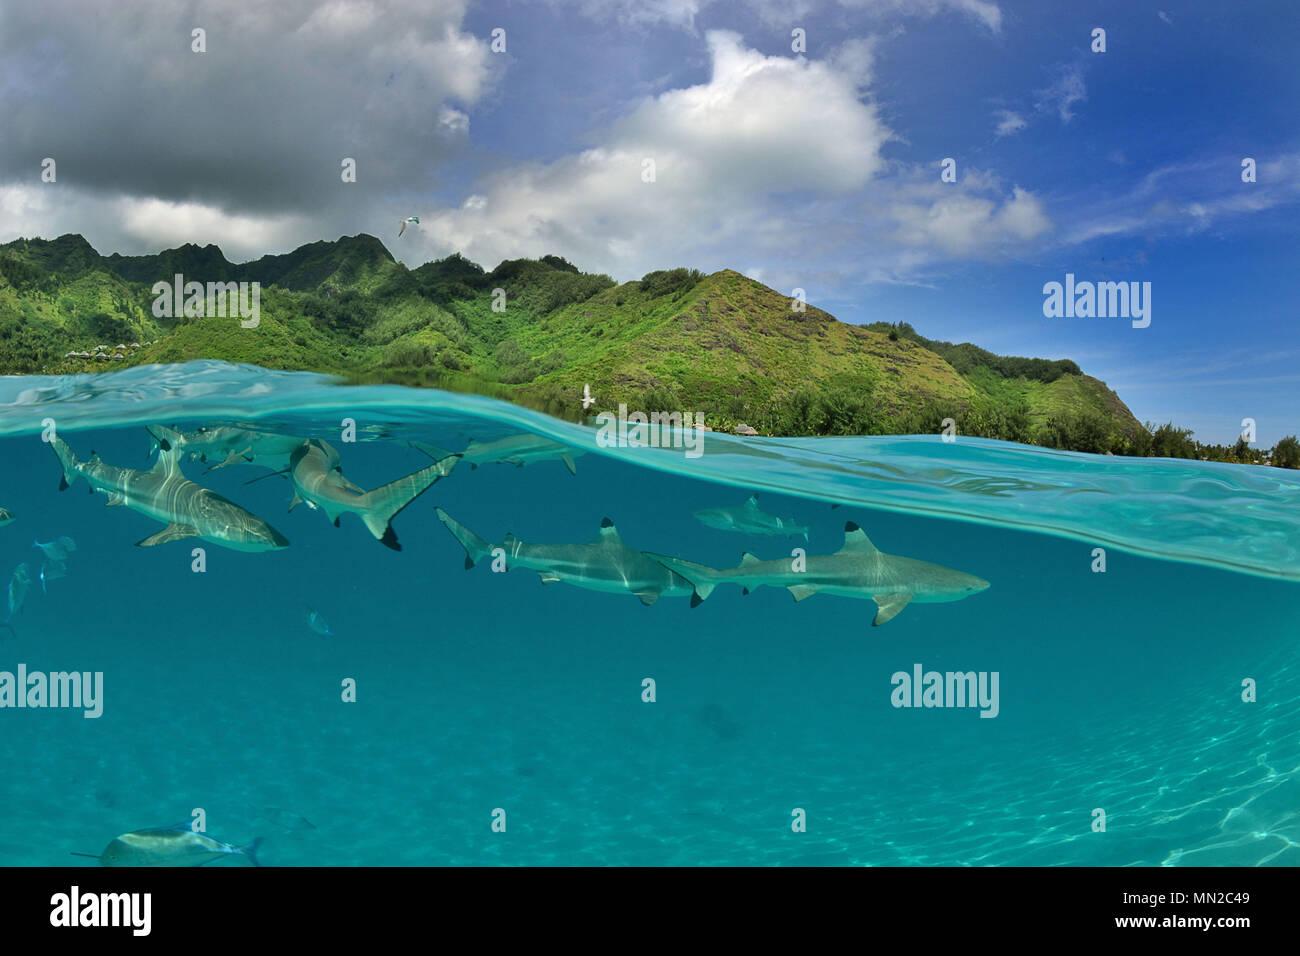 French Polynesia, Moorea: blacktip reef shark in the lagoon near the coast - Stock Image